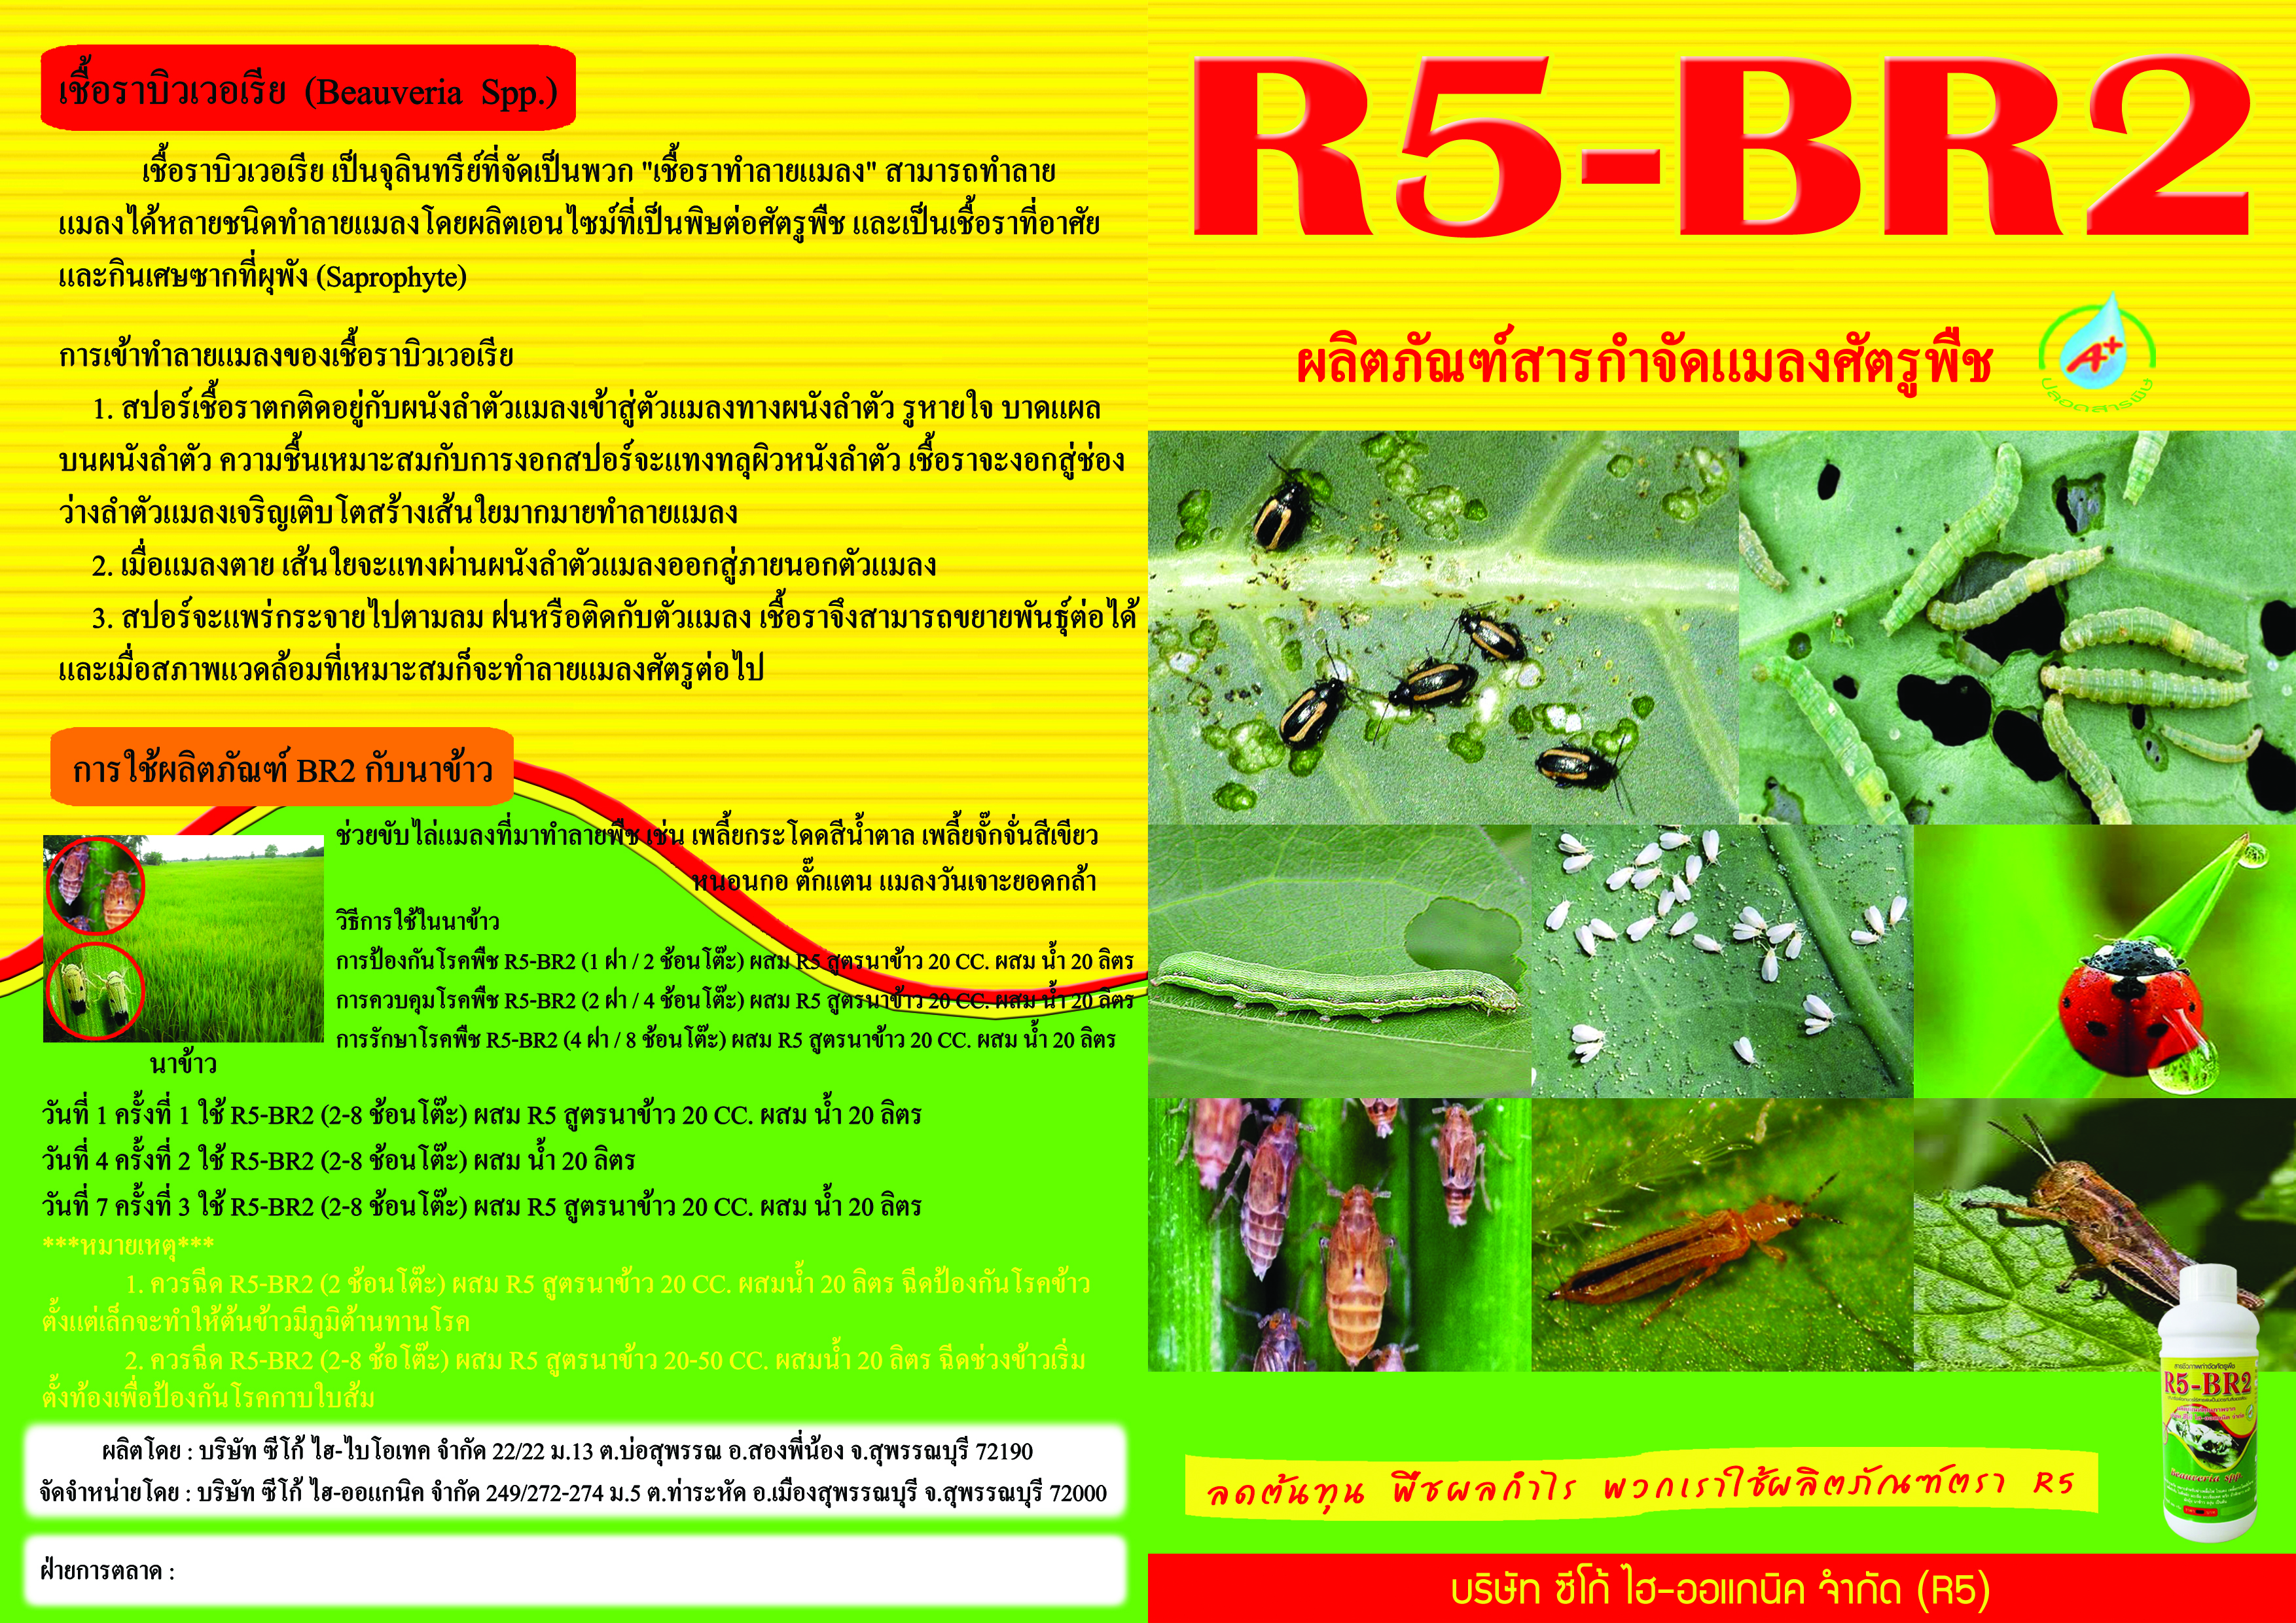 BR2-newนอก